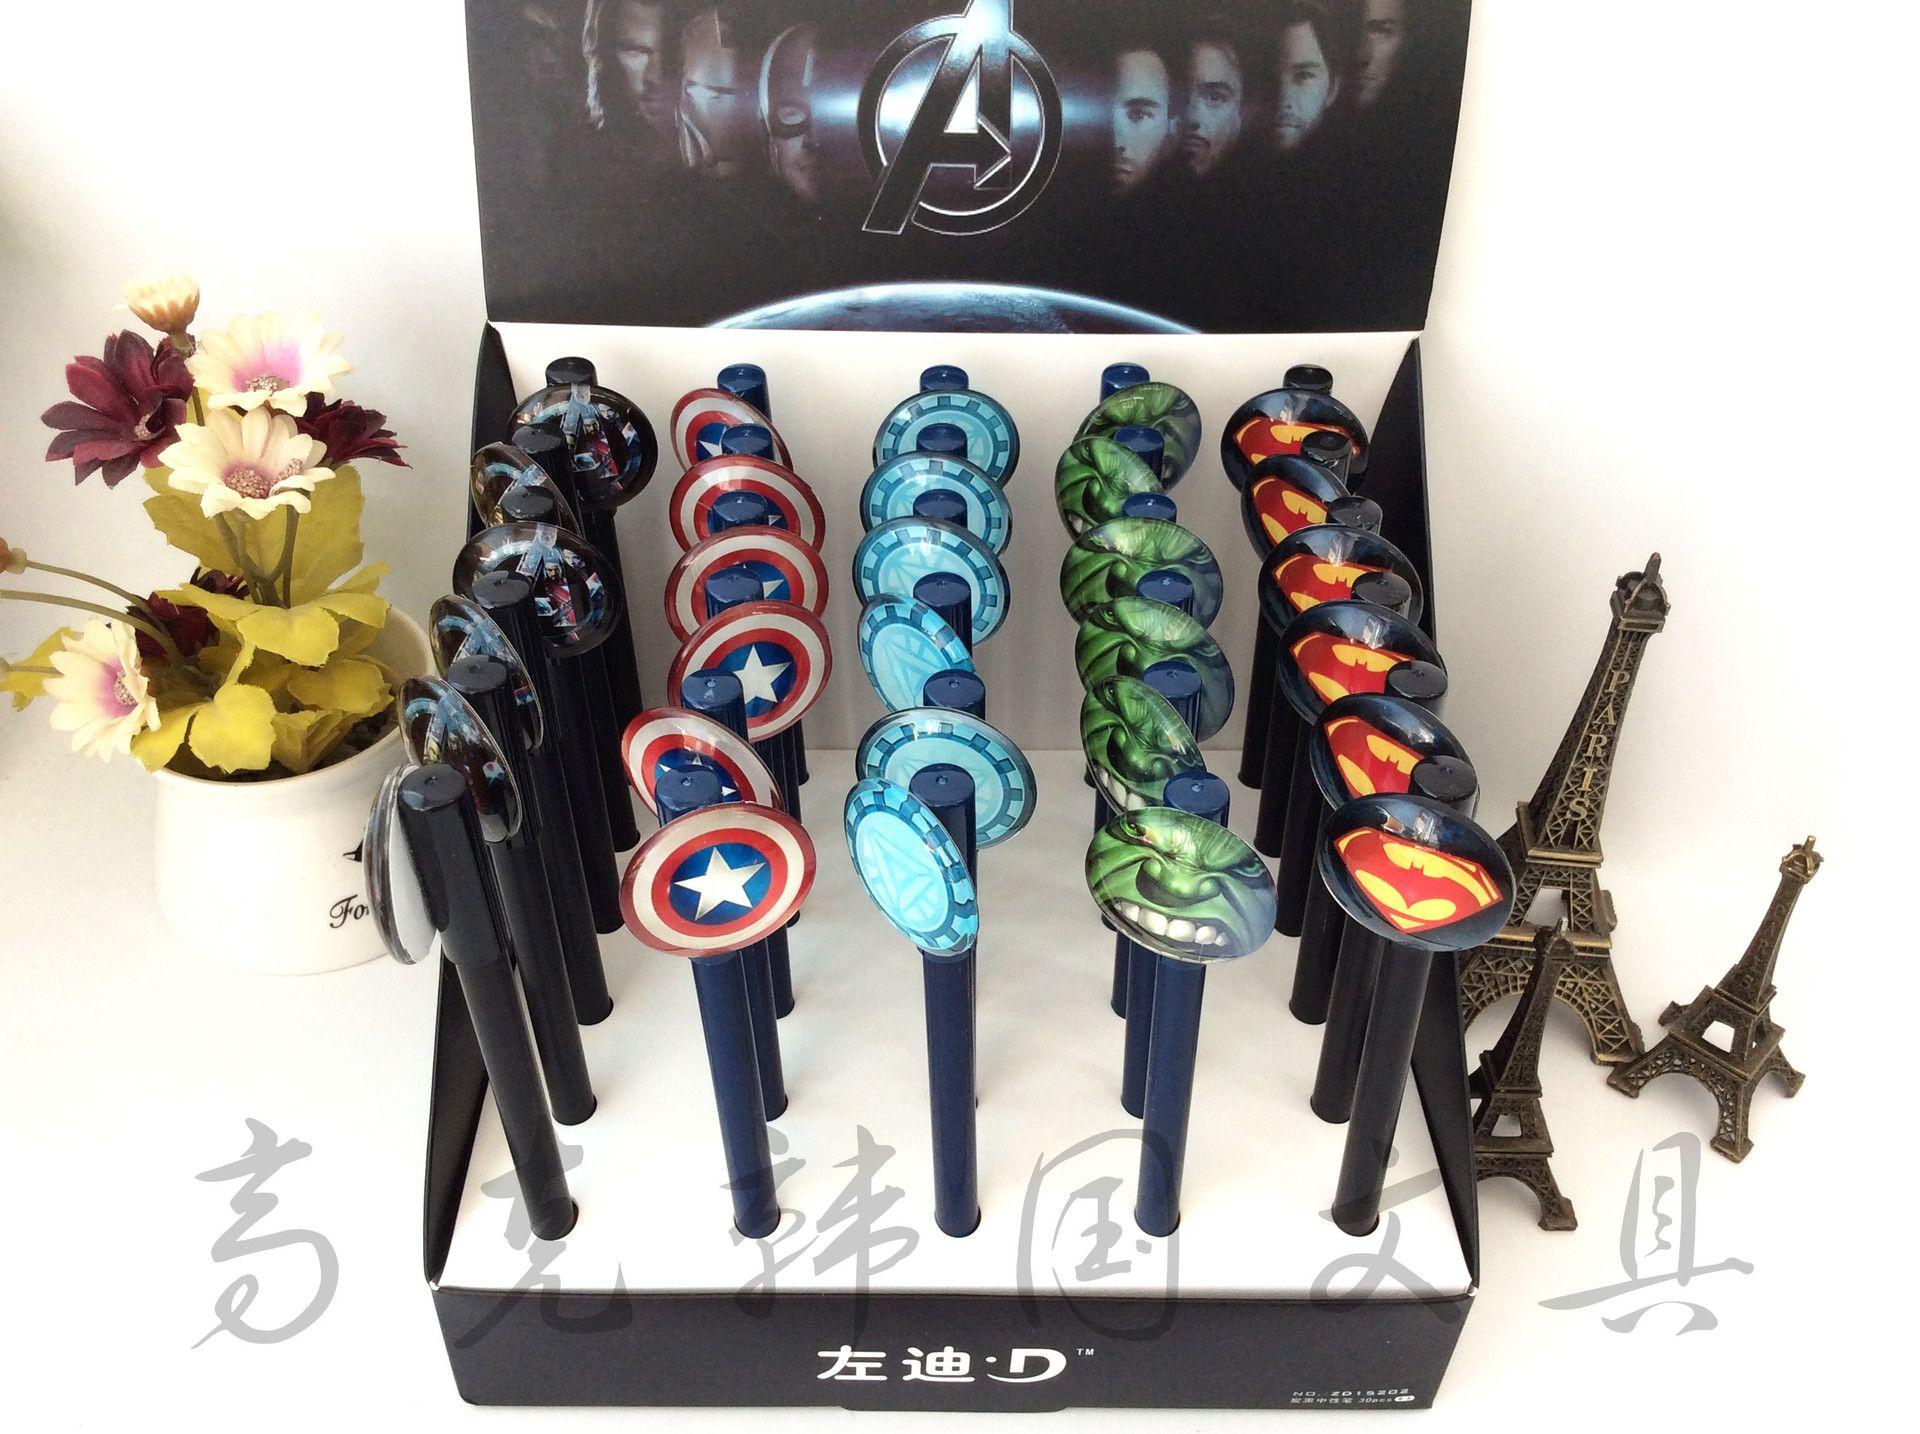 Shop Gel Pens Online, Avengers Gel Pens Cartoon Batman Superman Gel Pen  Stationery Novelty Gift Office Pens Super Hero Cartoons Pen Kawaii School  Supplies .